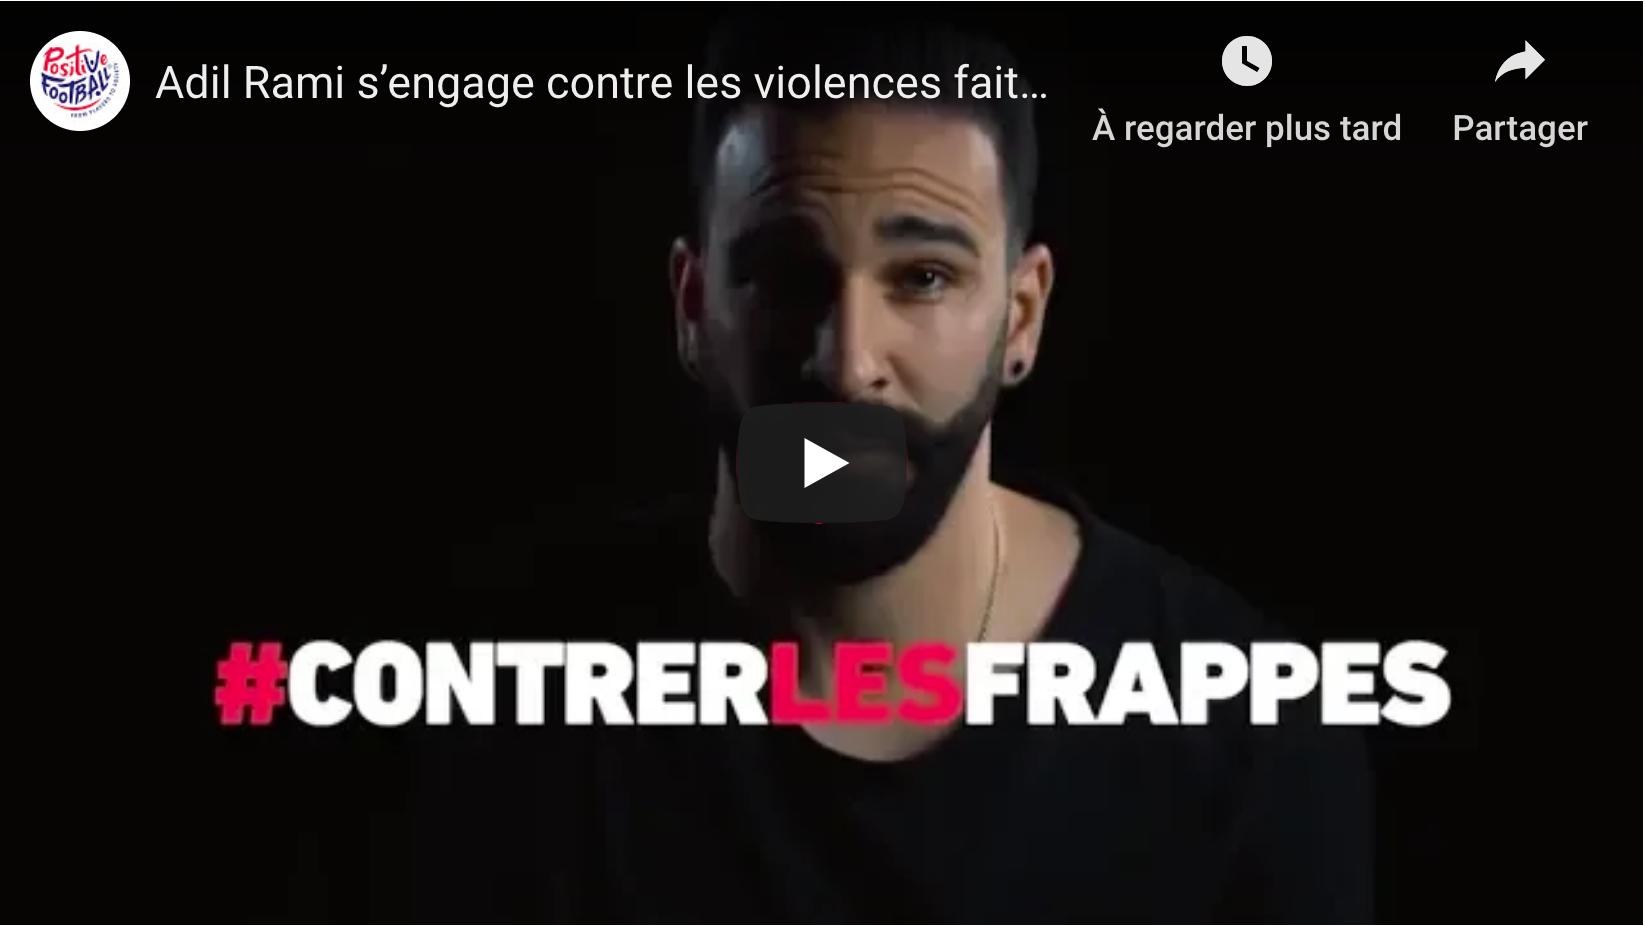 Presse_Film_manifeste_Positive_Football_Campagne_Violences_Rami_#CONTRERLESFRAPPES